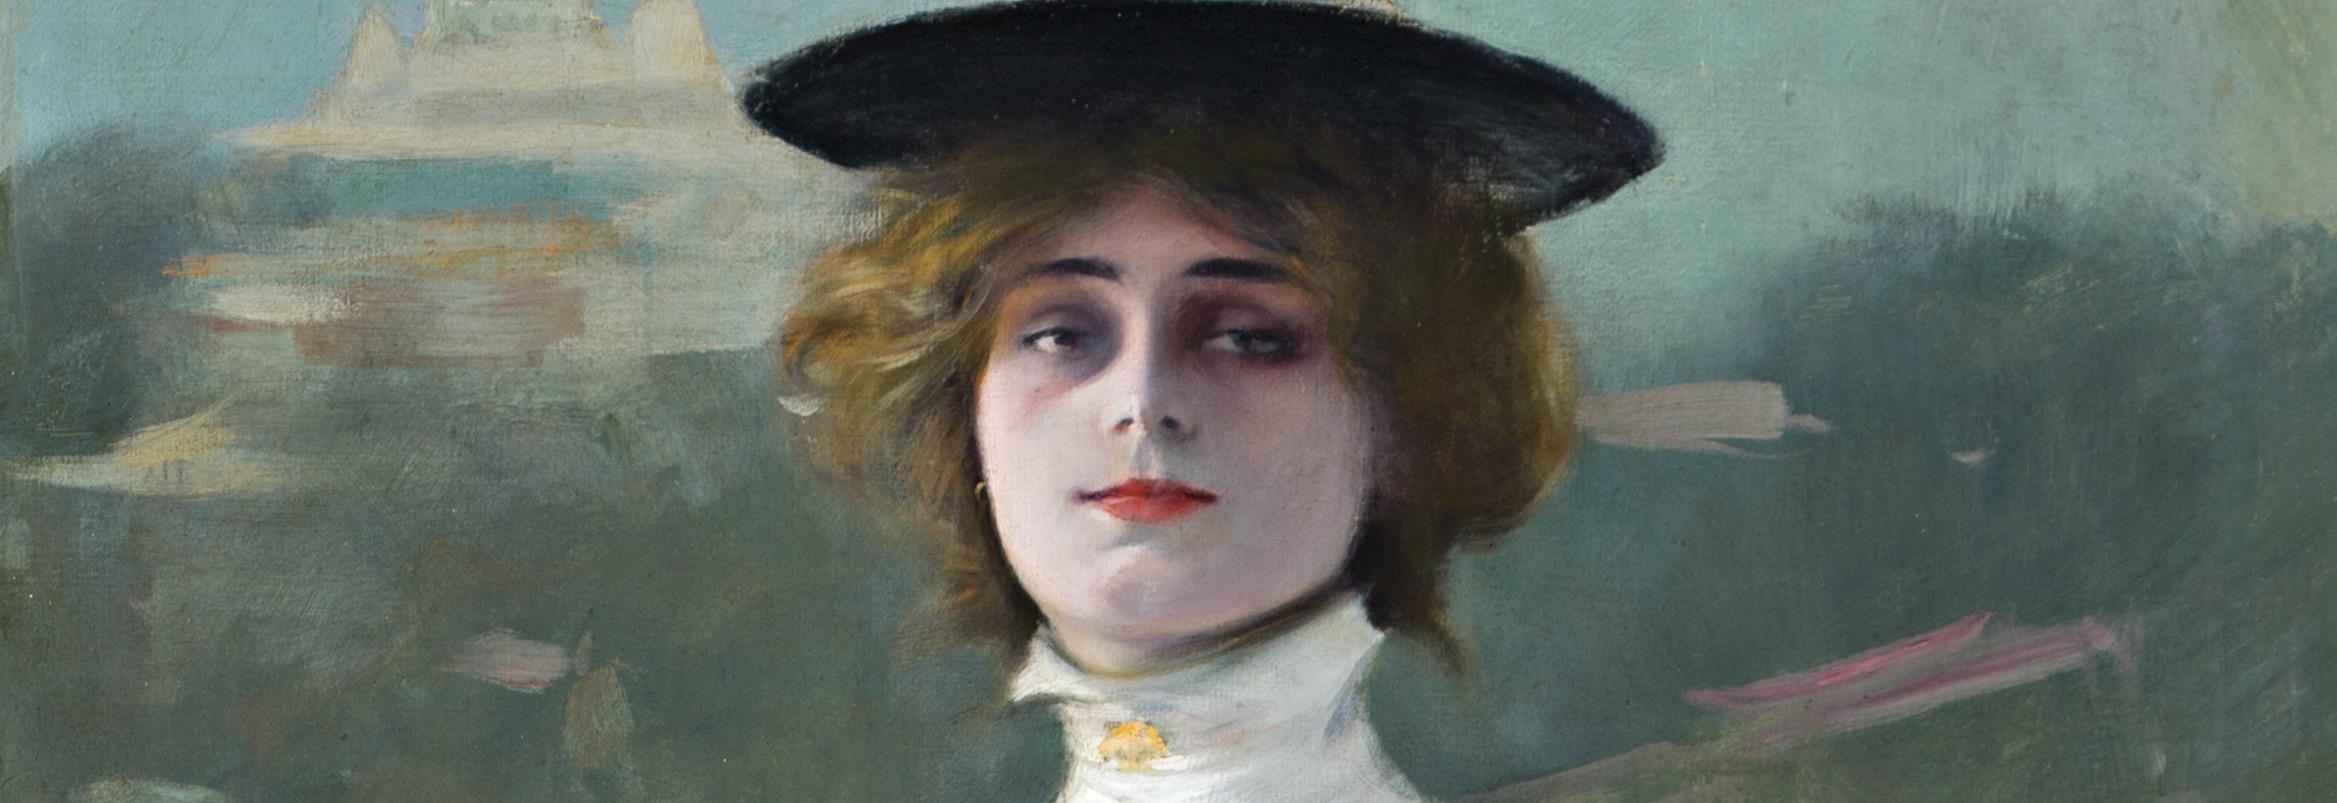 Ramón Casas. La Parisienne o La model, Montmartre, detalle. Salida: 120.000 euros